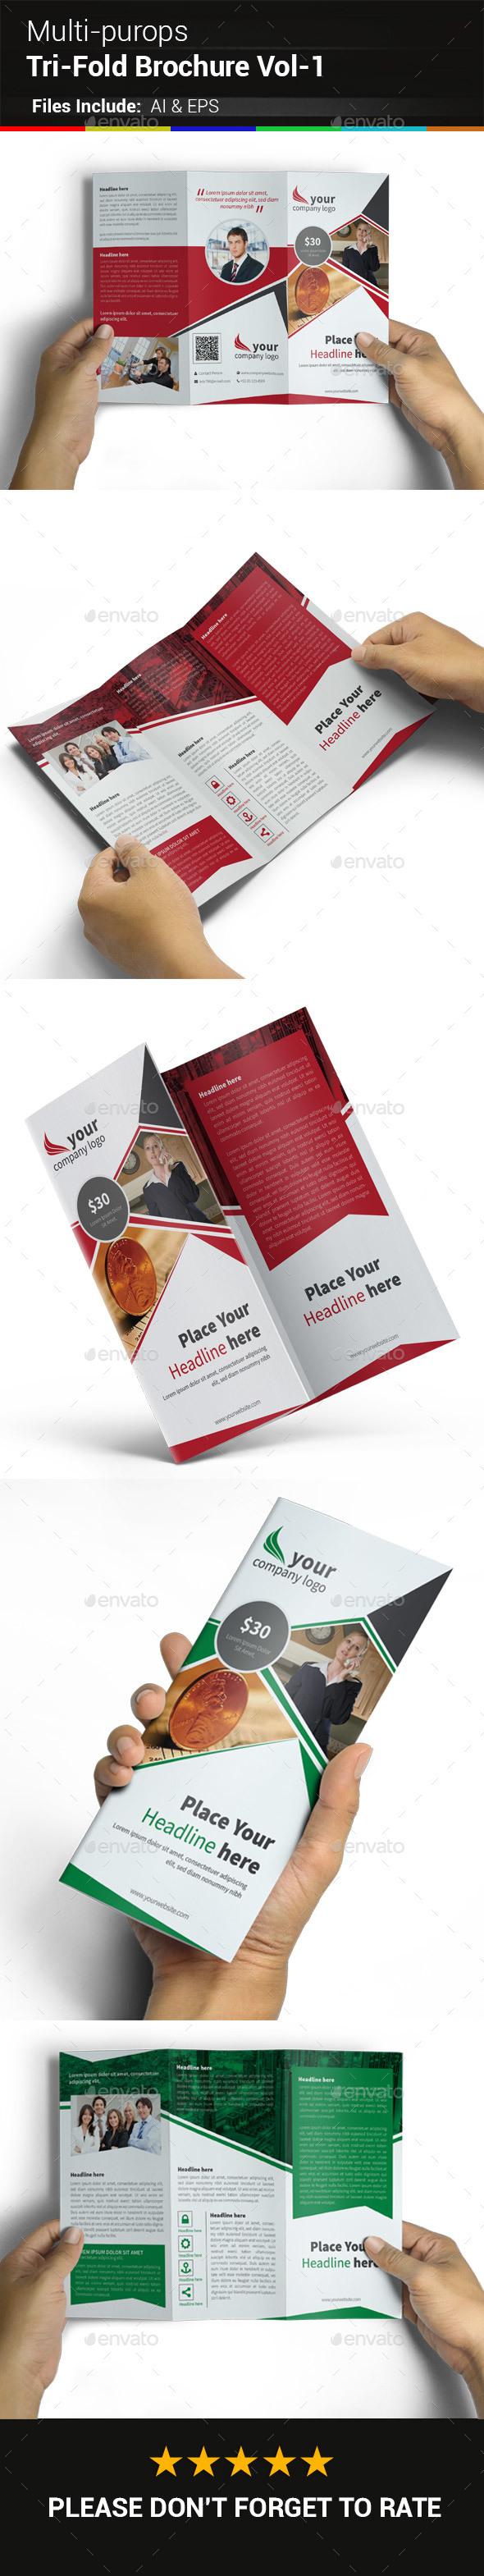 Multipurpose Business Tri-Fold Brochure Vol-1 - Corporate Brochures